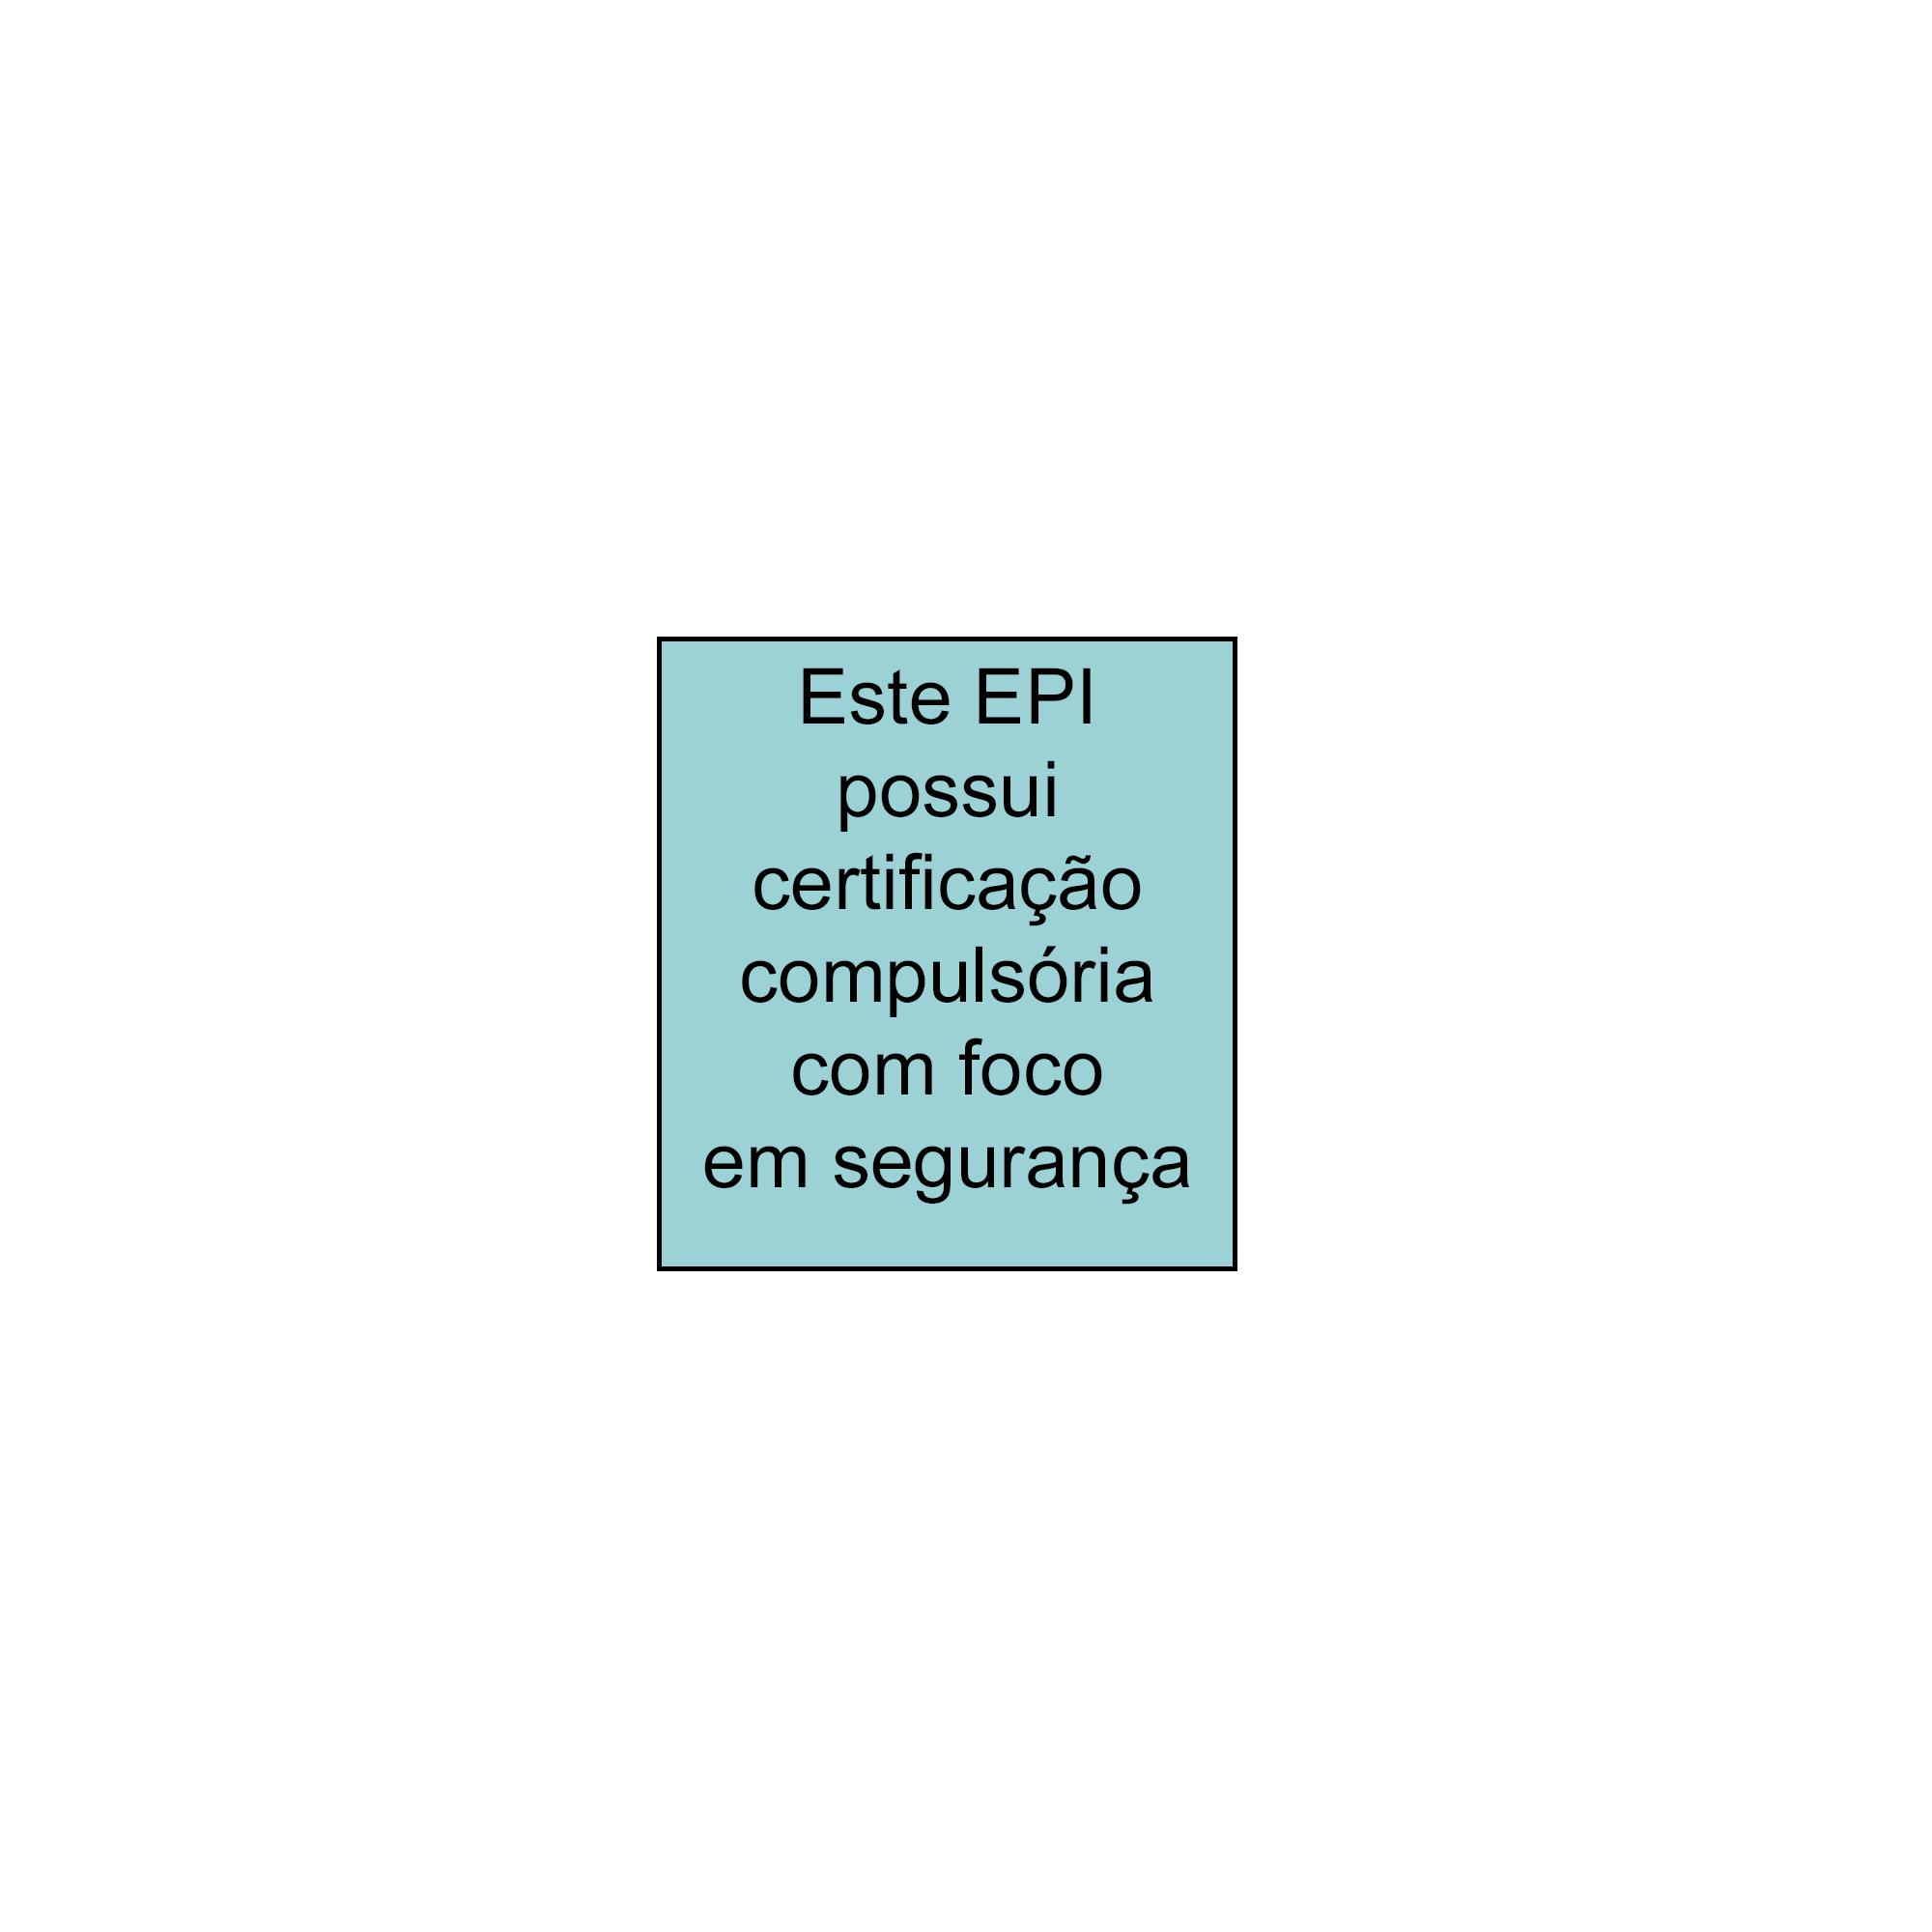 CAPACETE SEGURANÇA ABA FRONTAL PLASTCOR AZUL BIC  - DE PAULA EPI